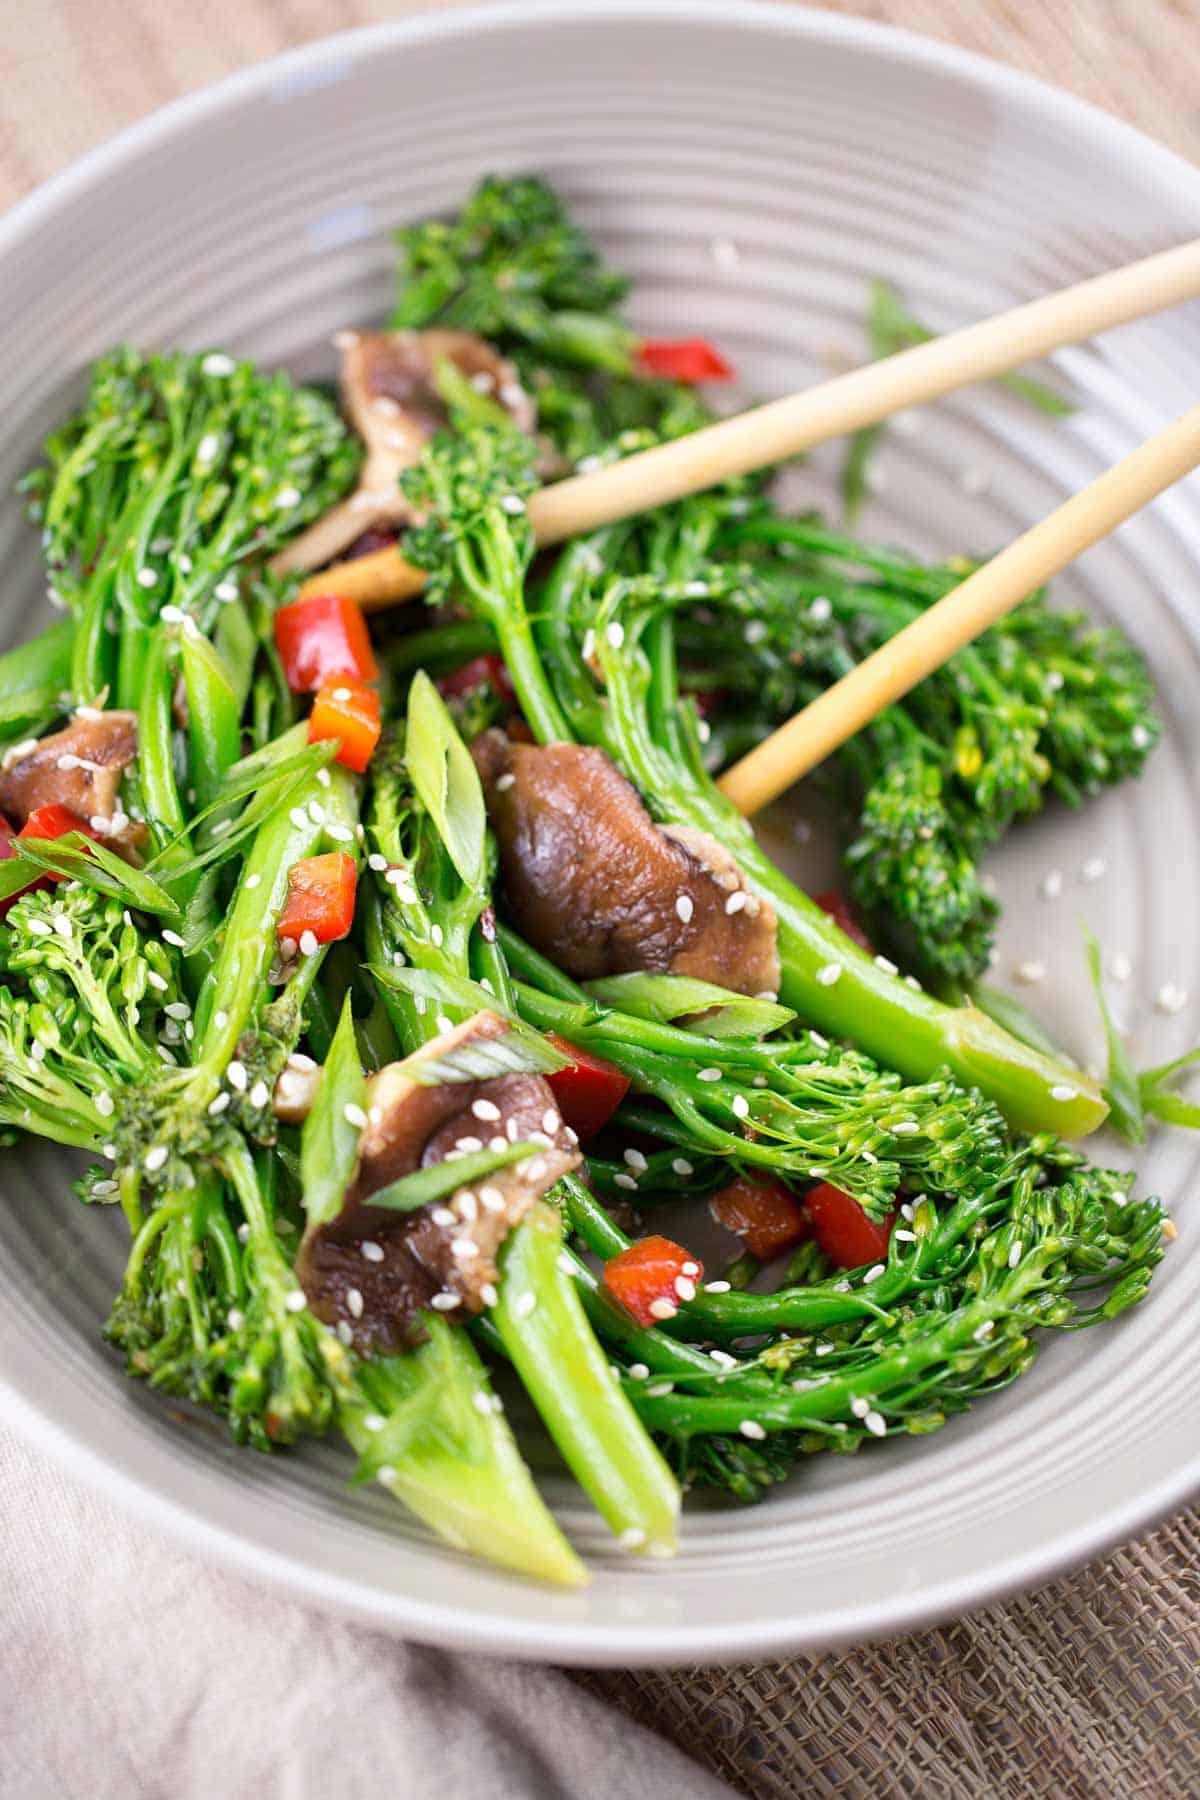 Chinese cuisine of broccolini mushroom sesame stir-fry plate eating chop sticks | jessicagavin.com